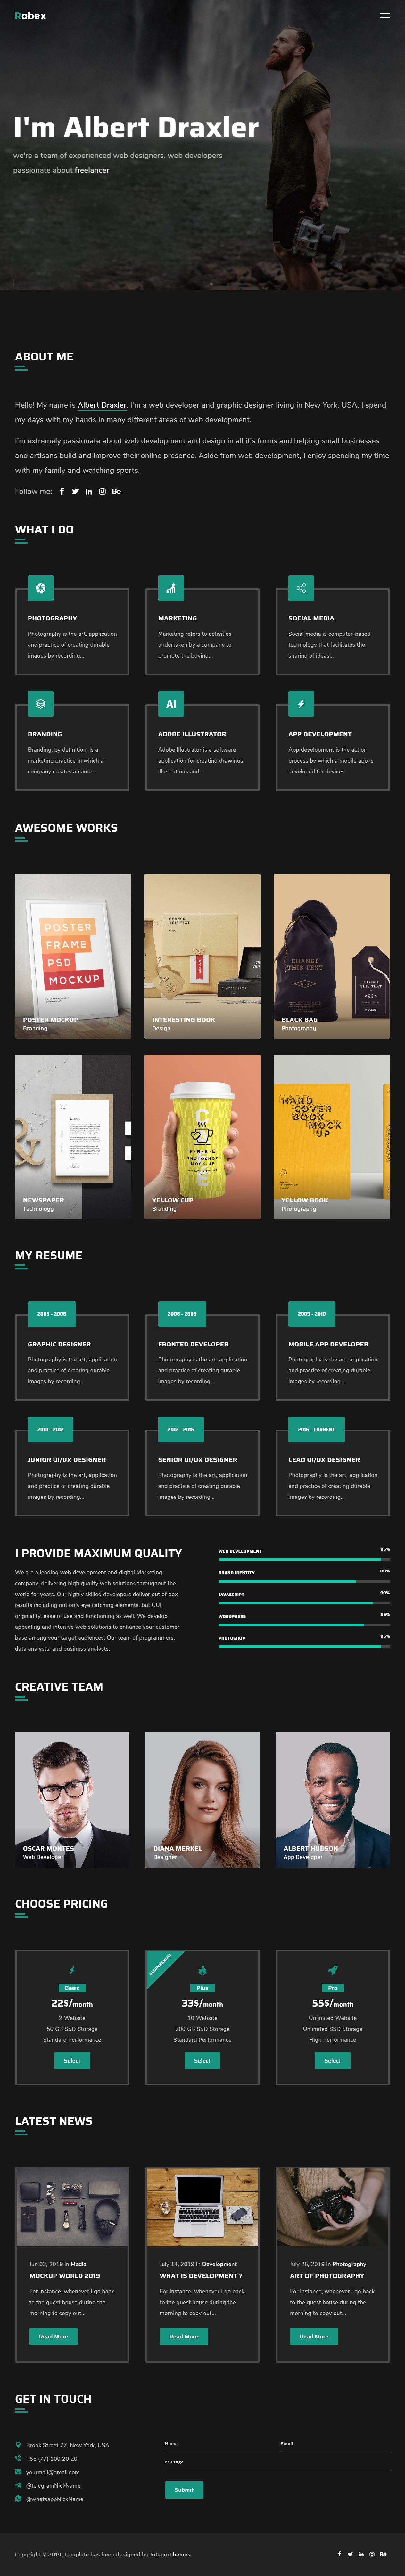 35+ Best Responsive HTML5 Portfolio Templates 2019 - Responsive Miracle